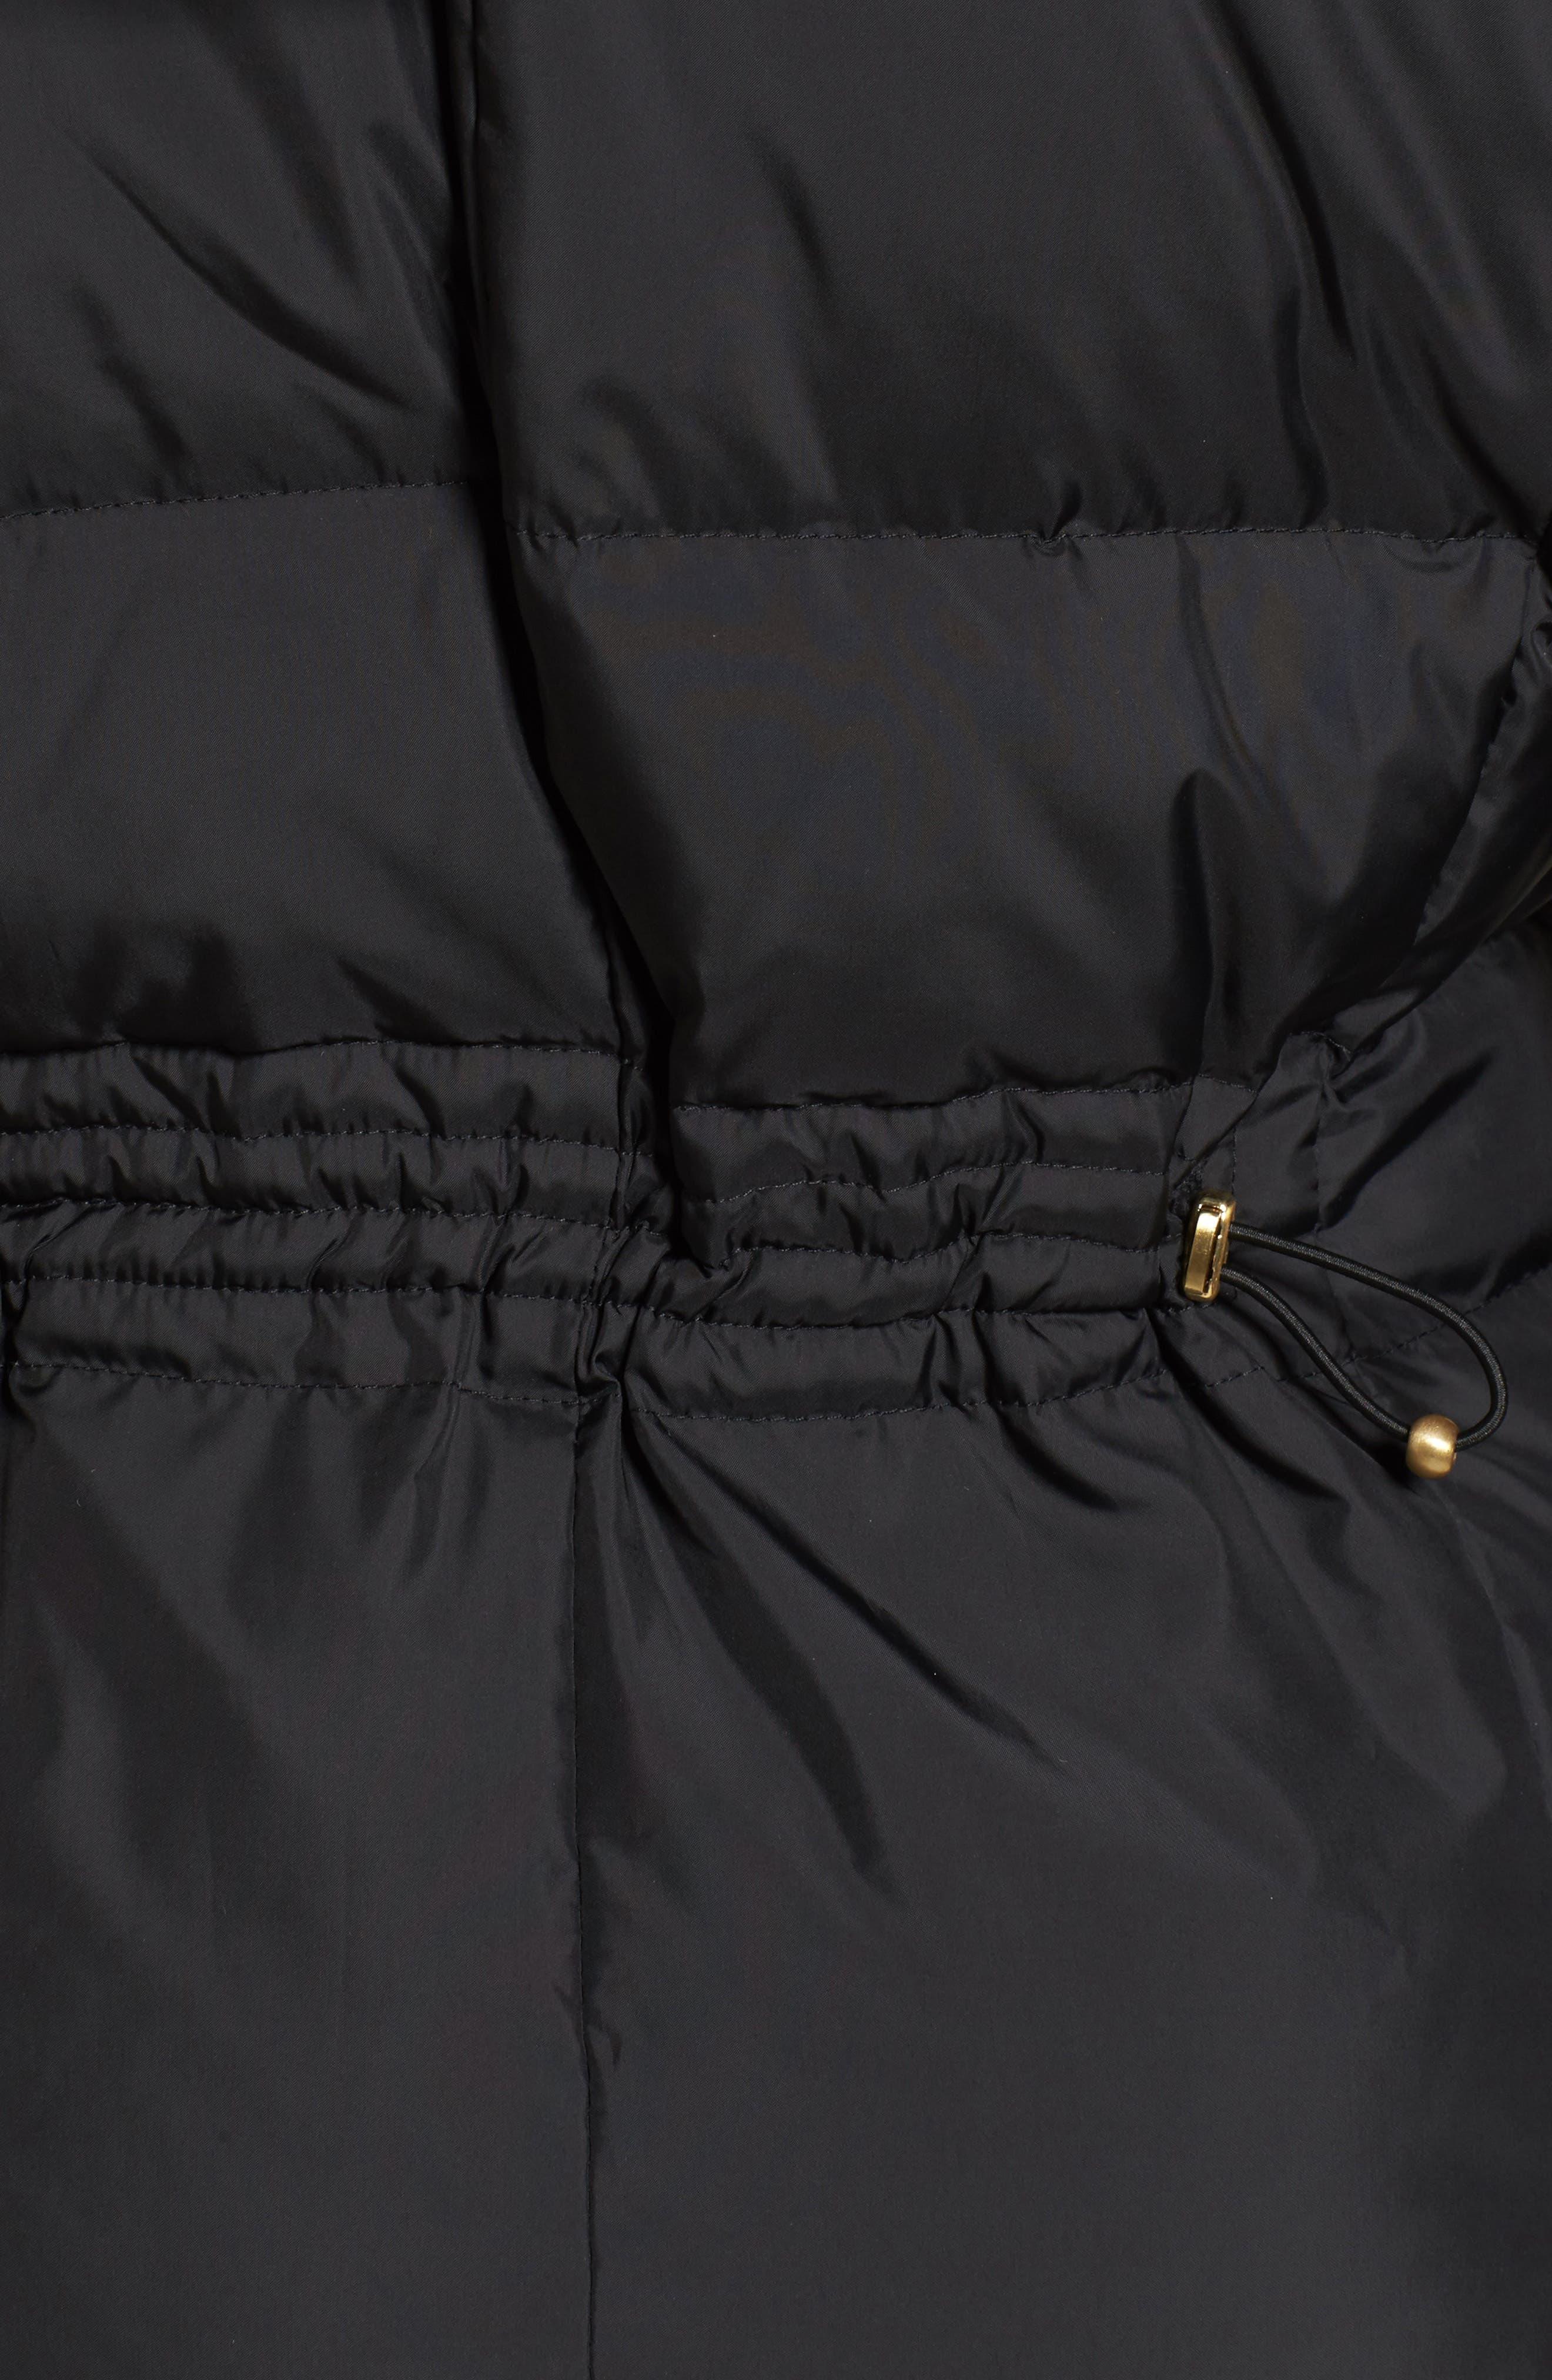 3/4 Down Coat with Faux Fur Hood,                             Alternate thumbnail 6, color,                             001